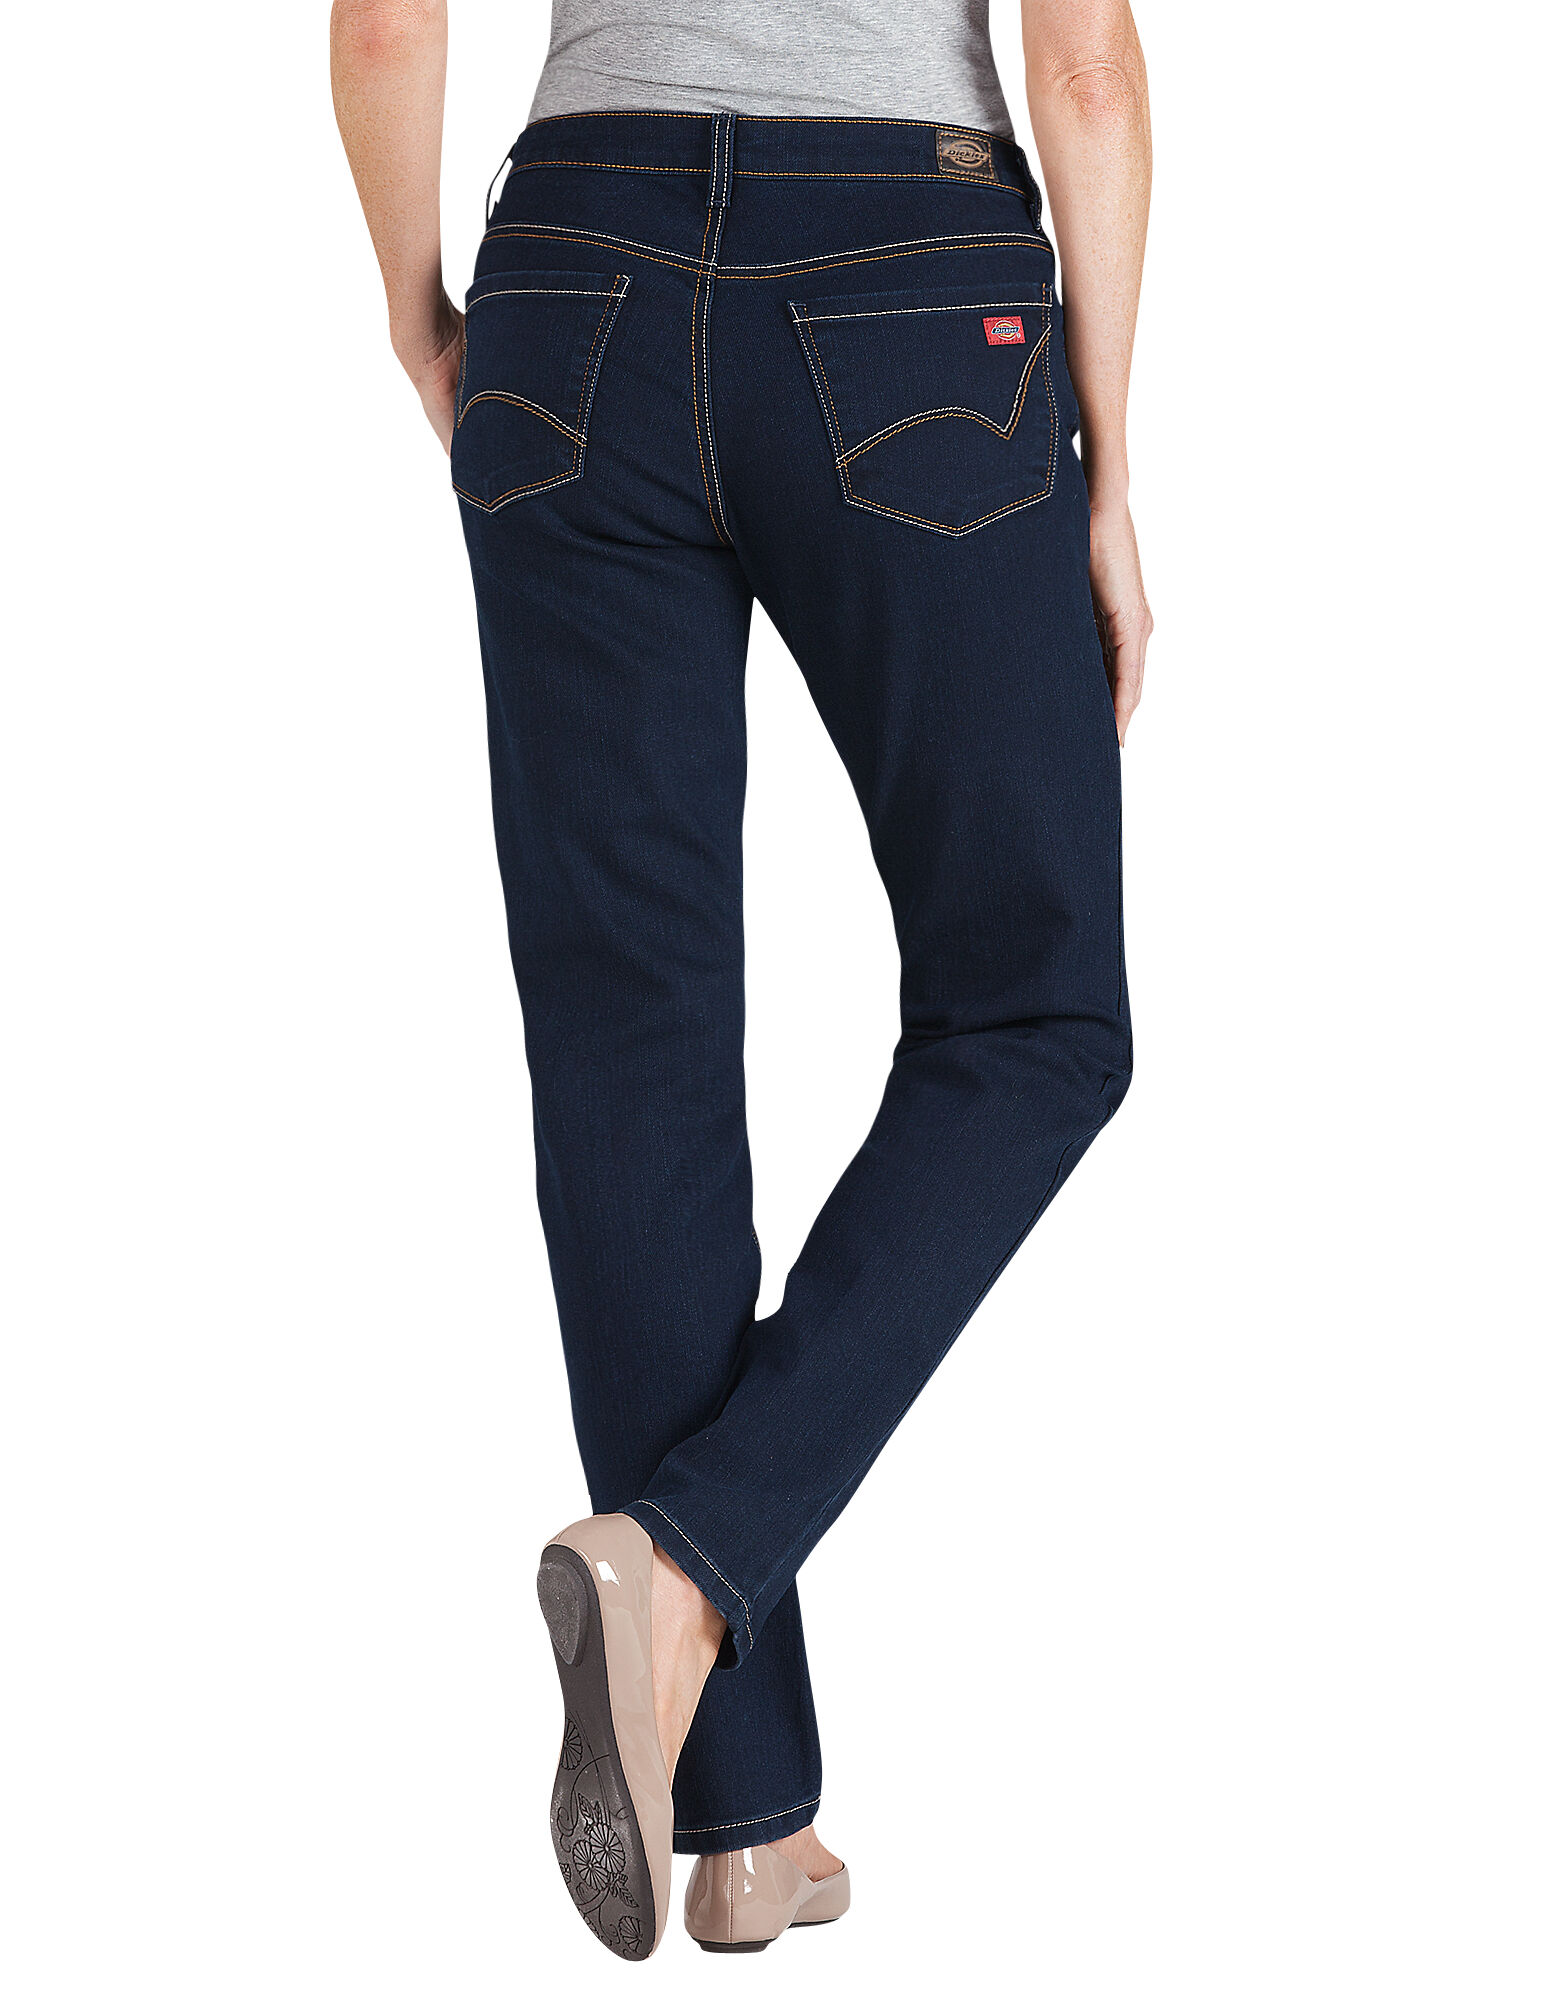 Women&39s Curvy Fit Skinny Leg Denim Jean   Womens Jeans   Dickies